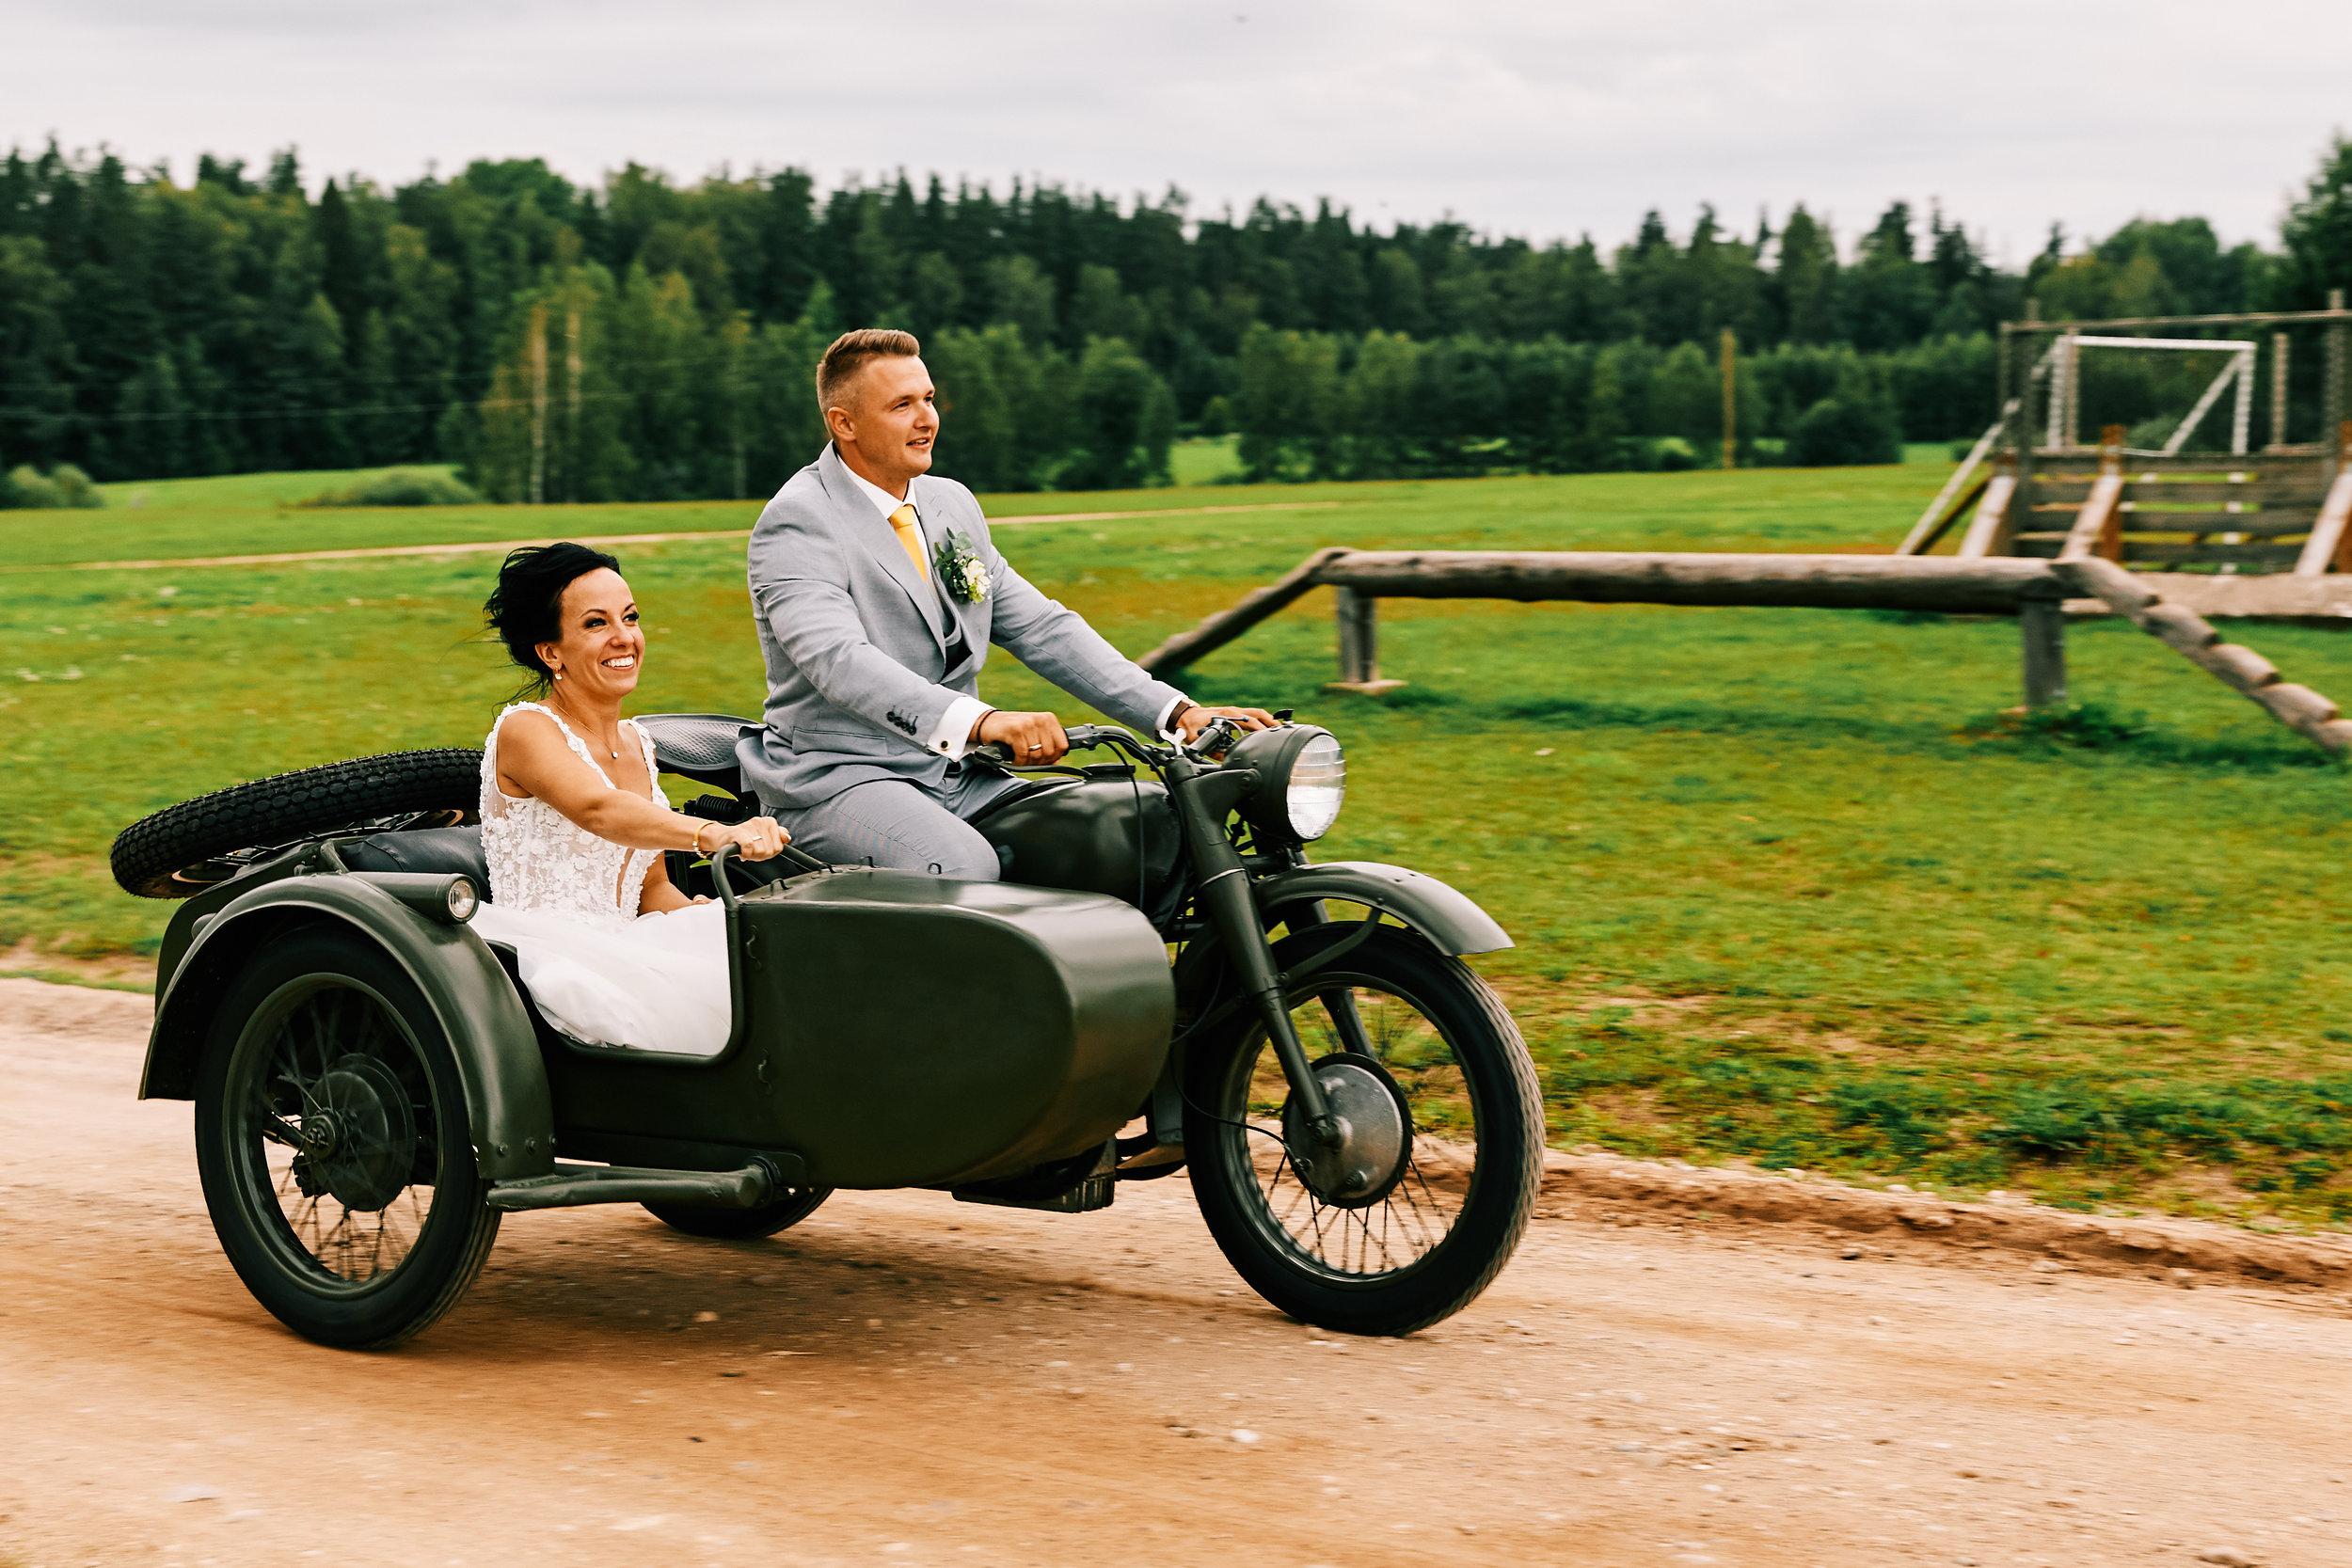 0029 www.skutelisfoto.com.jpg